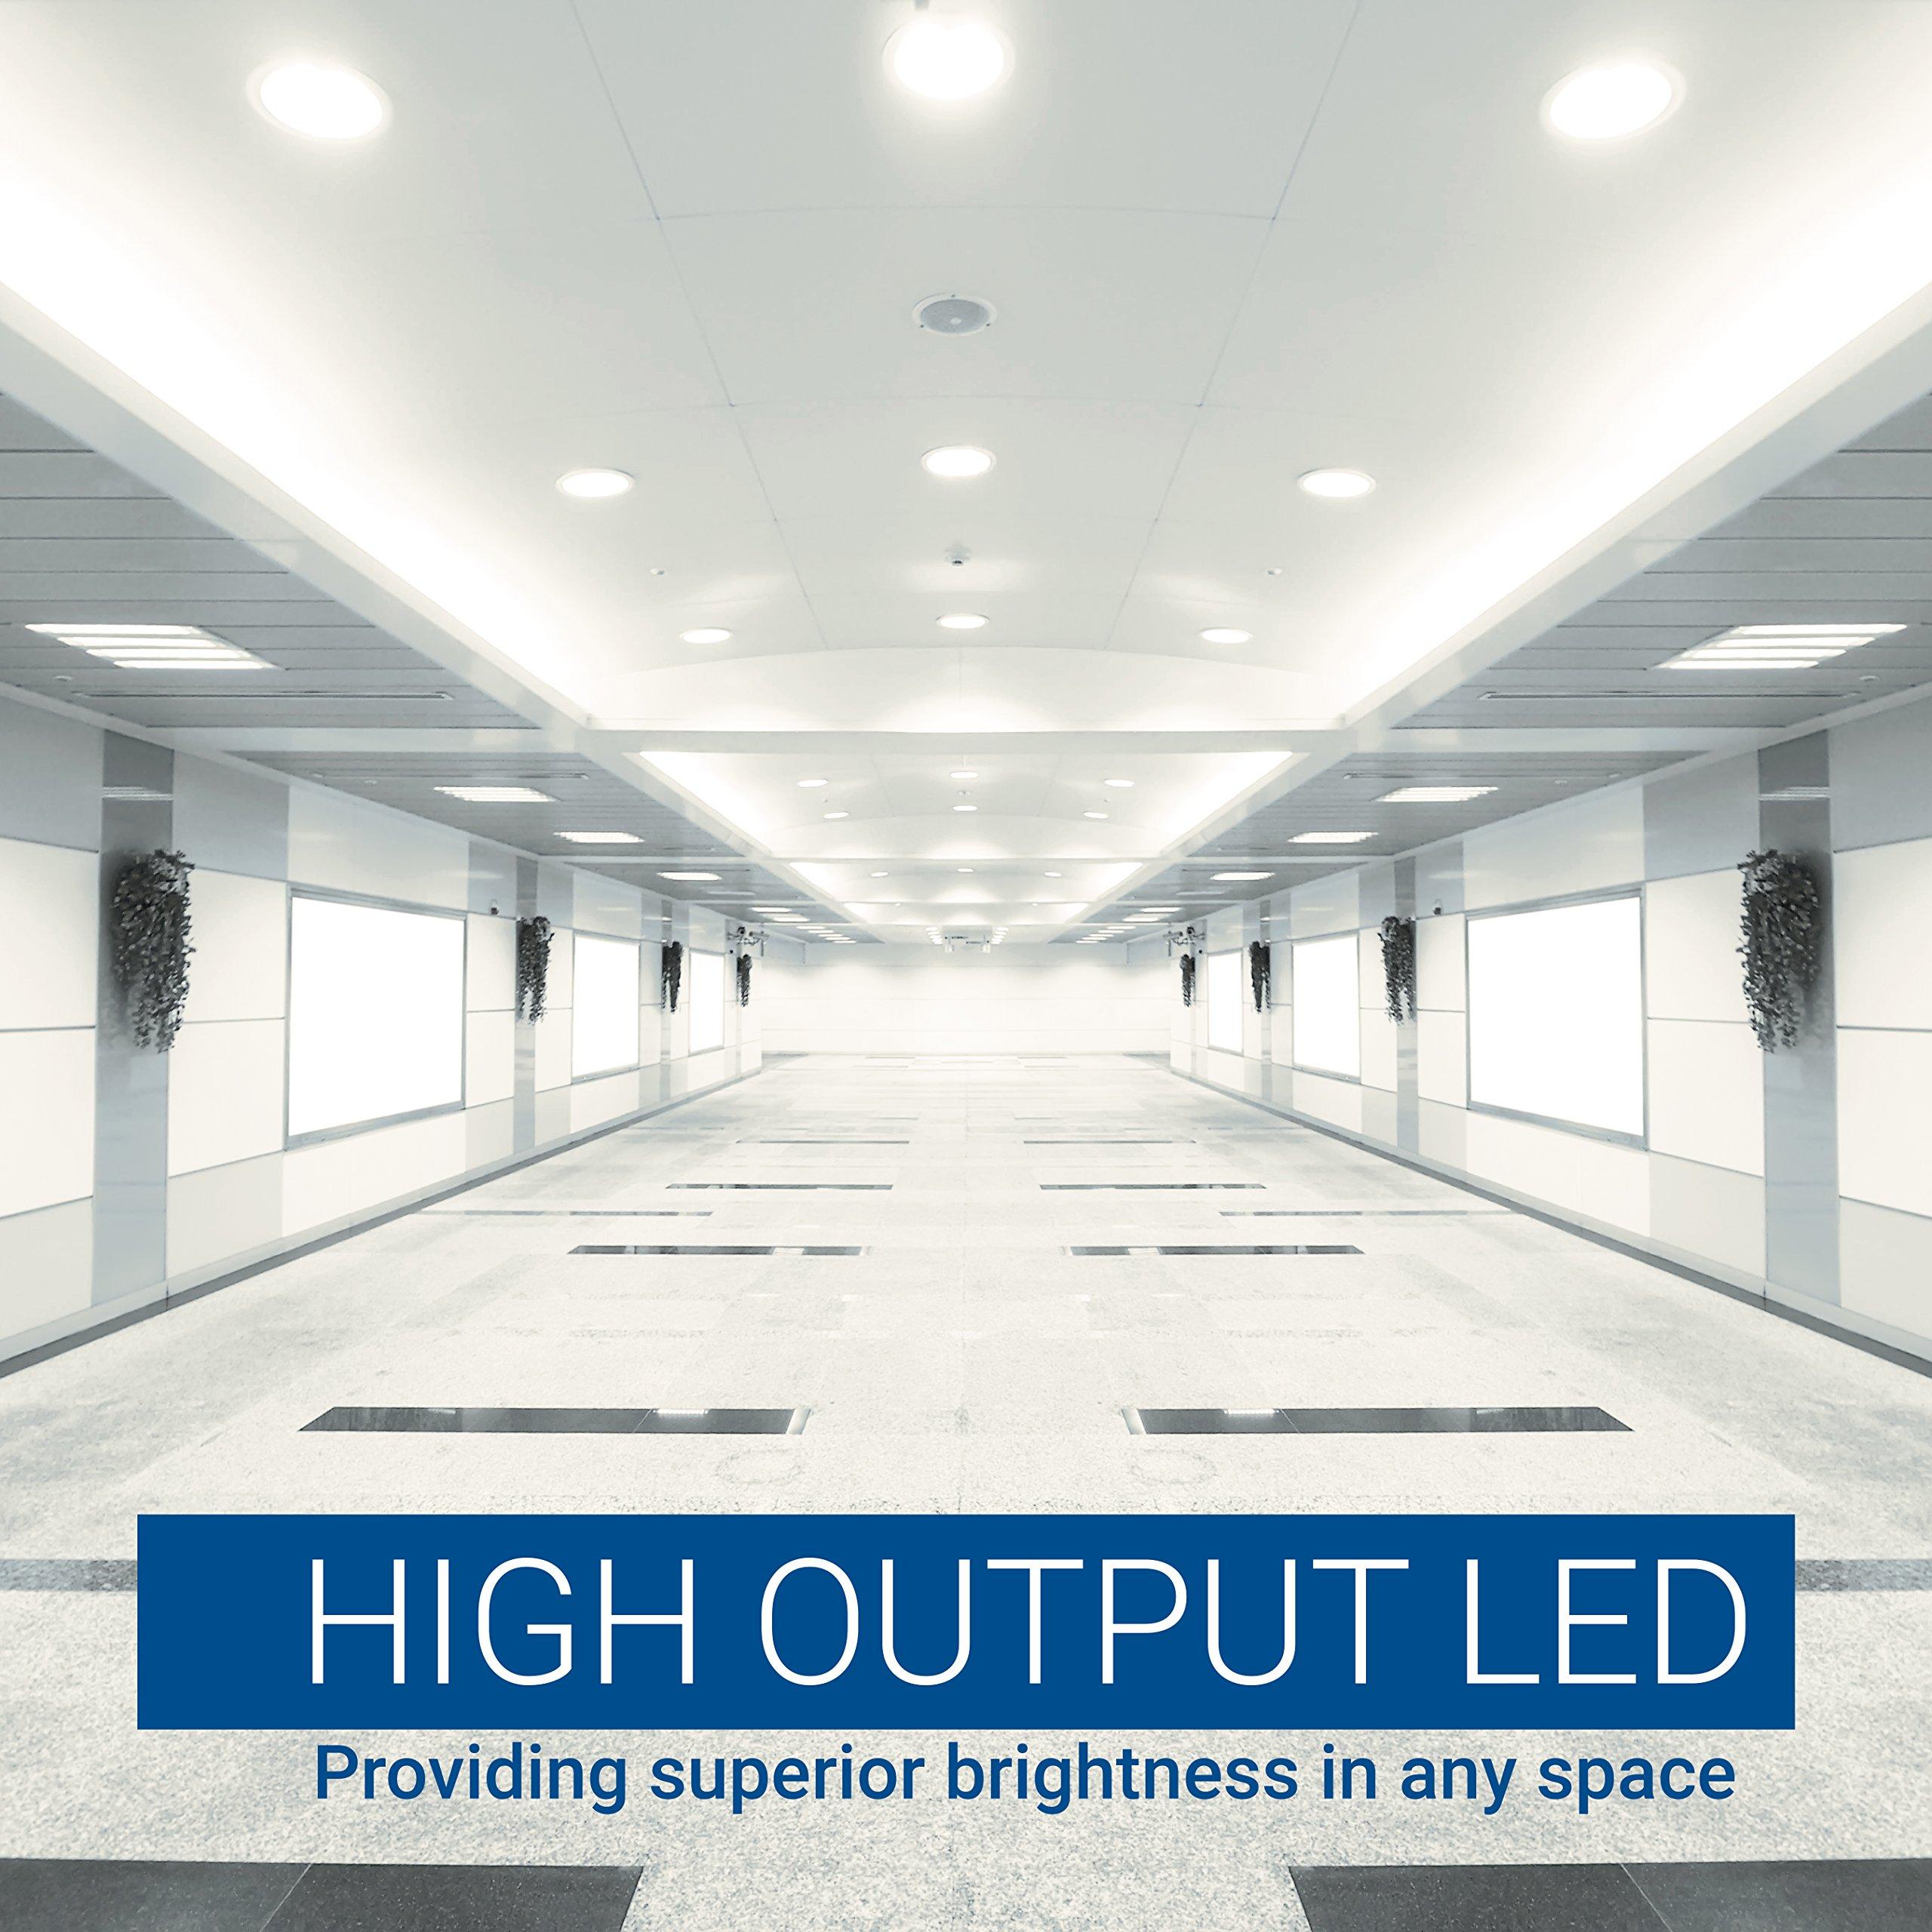 Hyperikon T8 8 Foot LED Bulb, 75 Watt (36W), T10 T12 Light Tube, 4000K Daylight, Dual End Ballast Bypass, Frosted, 4 Pack by Hyperikon (Image #5)